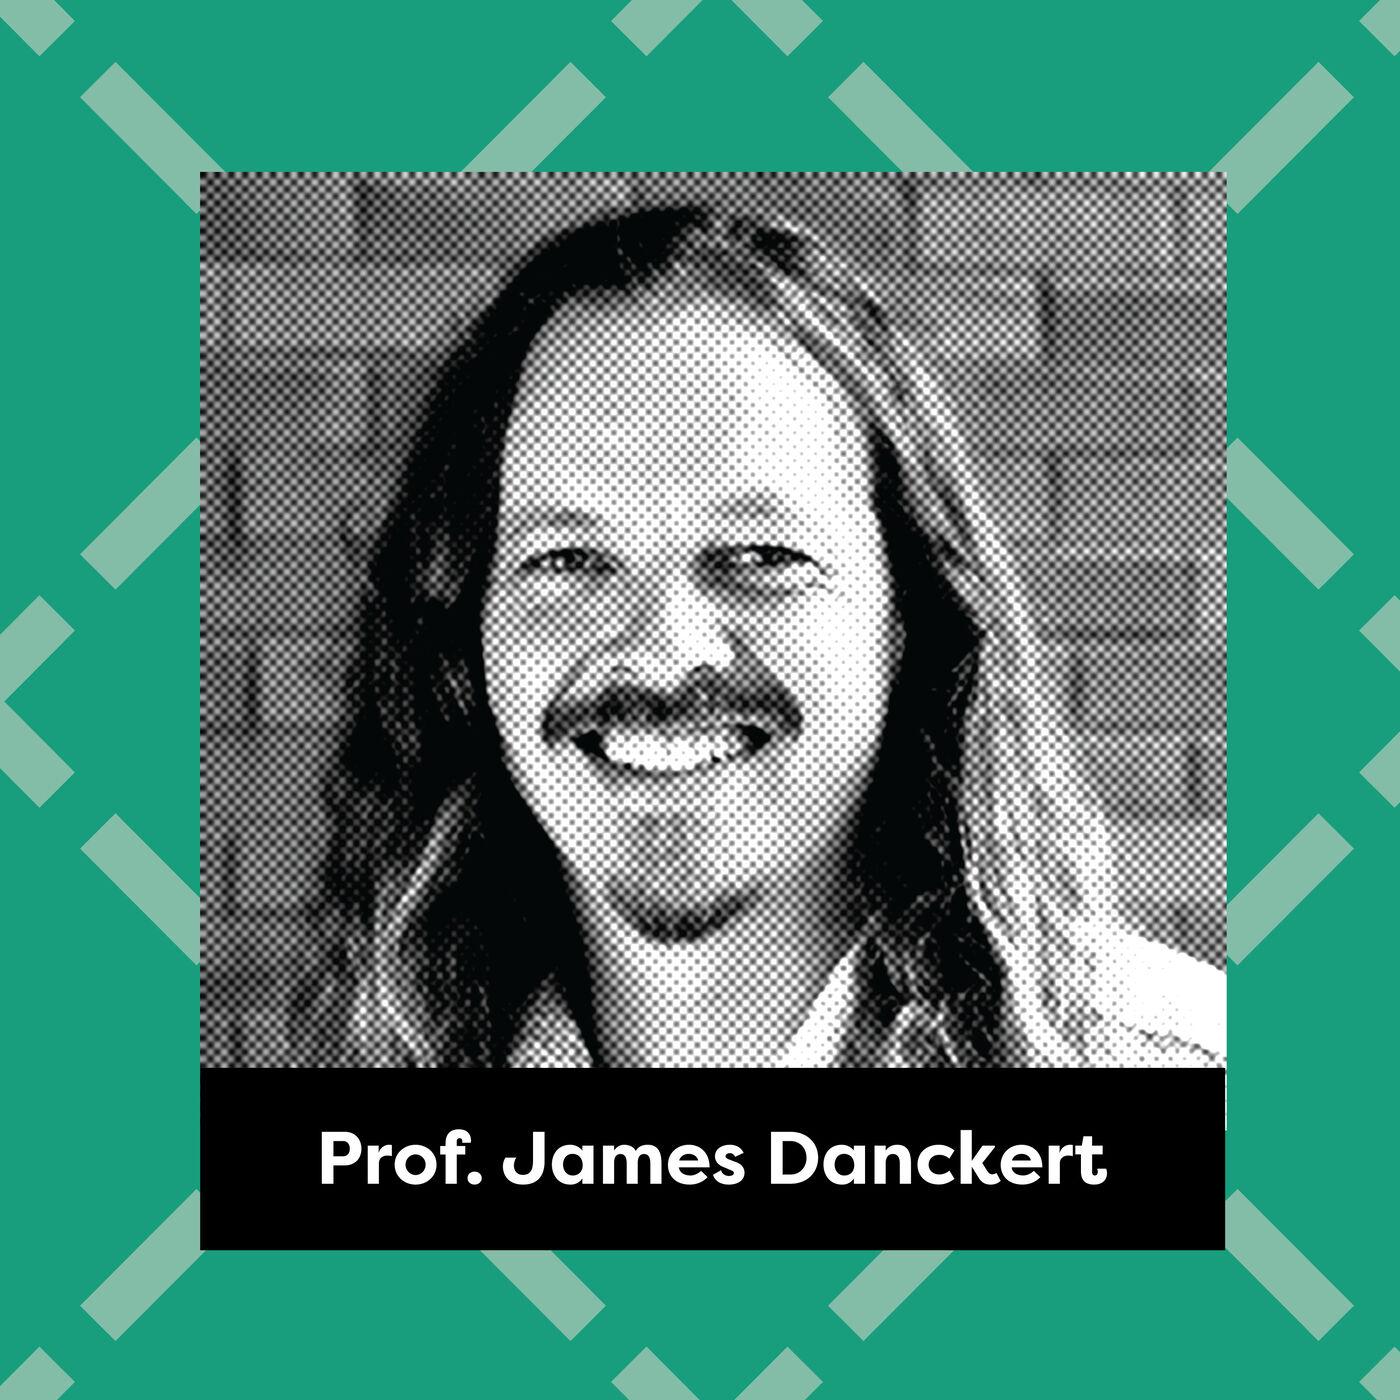 Ep. 121: Dr. James Danckert - Nothing Humdrum About Boredom